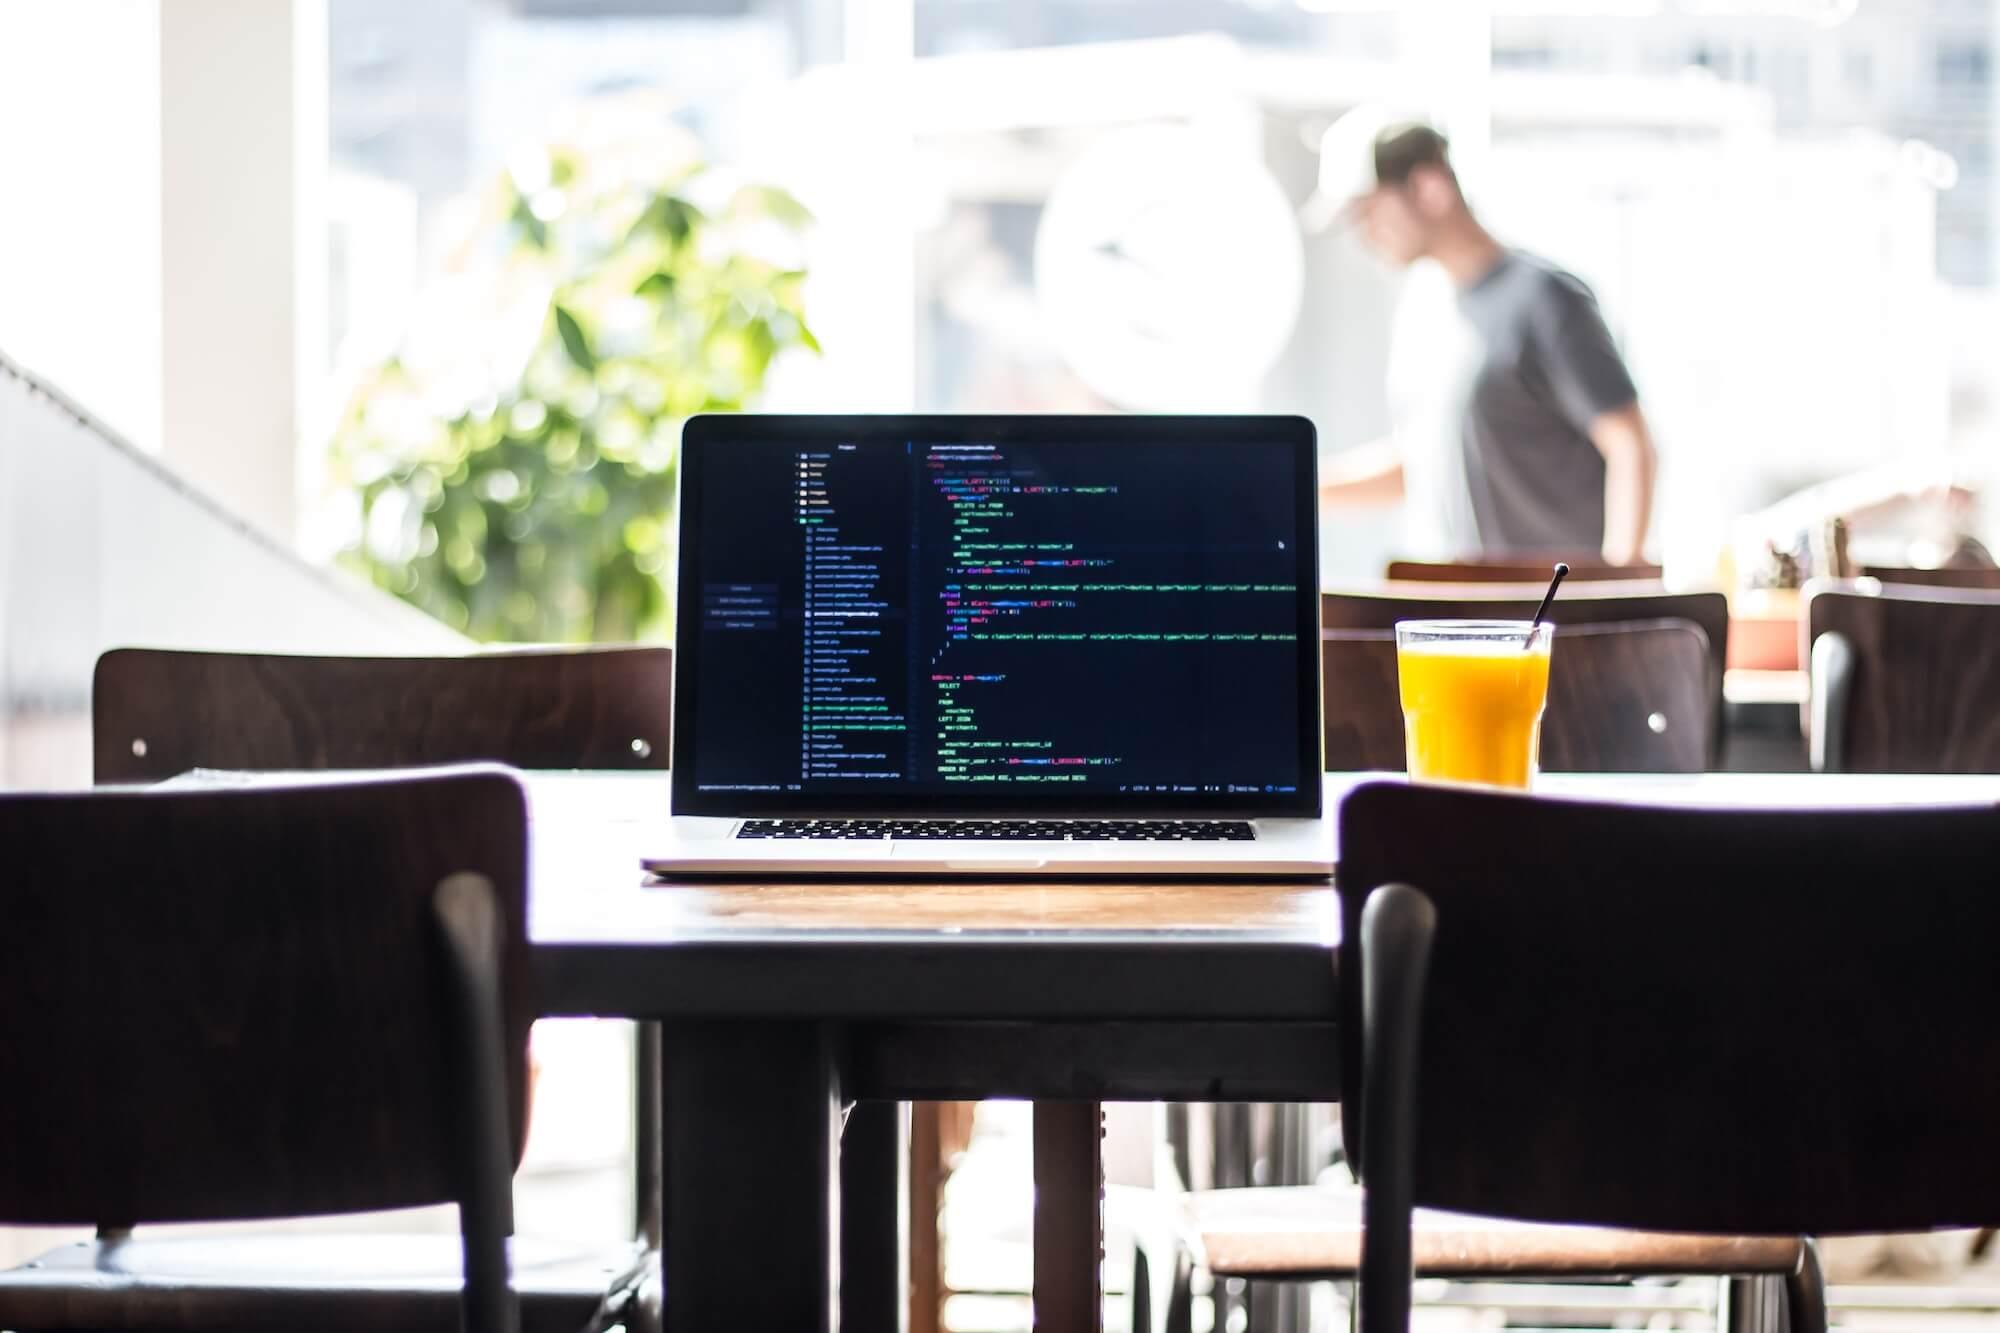 Introduction to MVVM: Refactoring a MVC App into MVVM Design